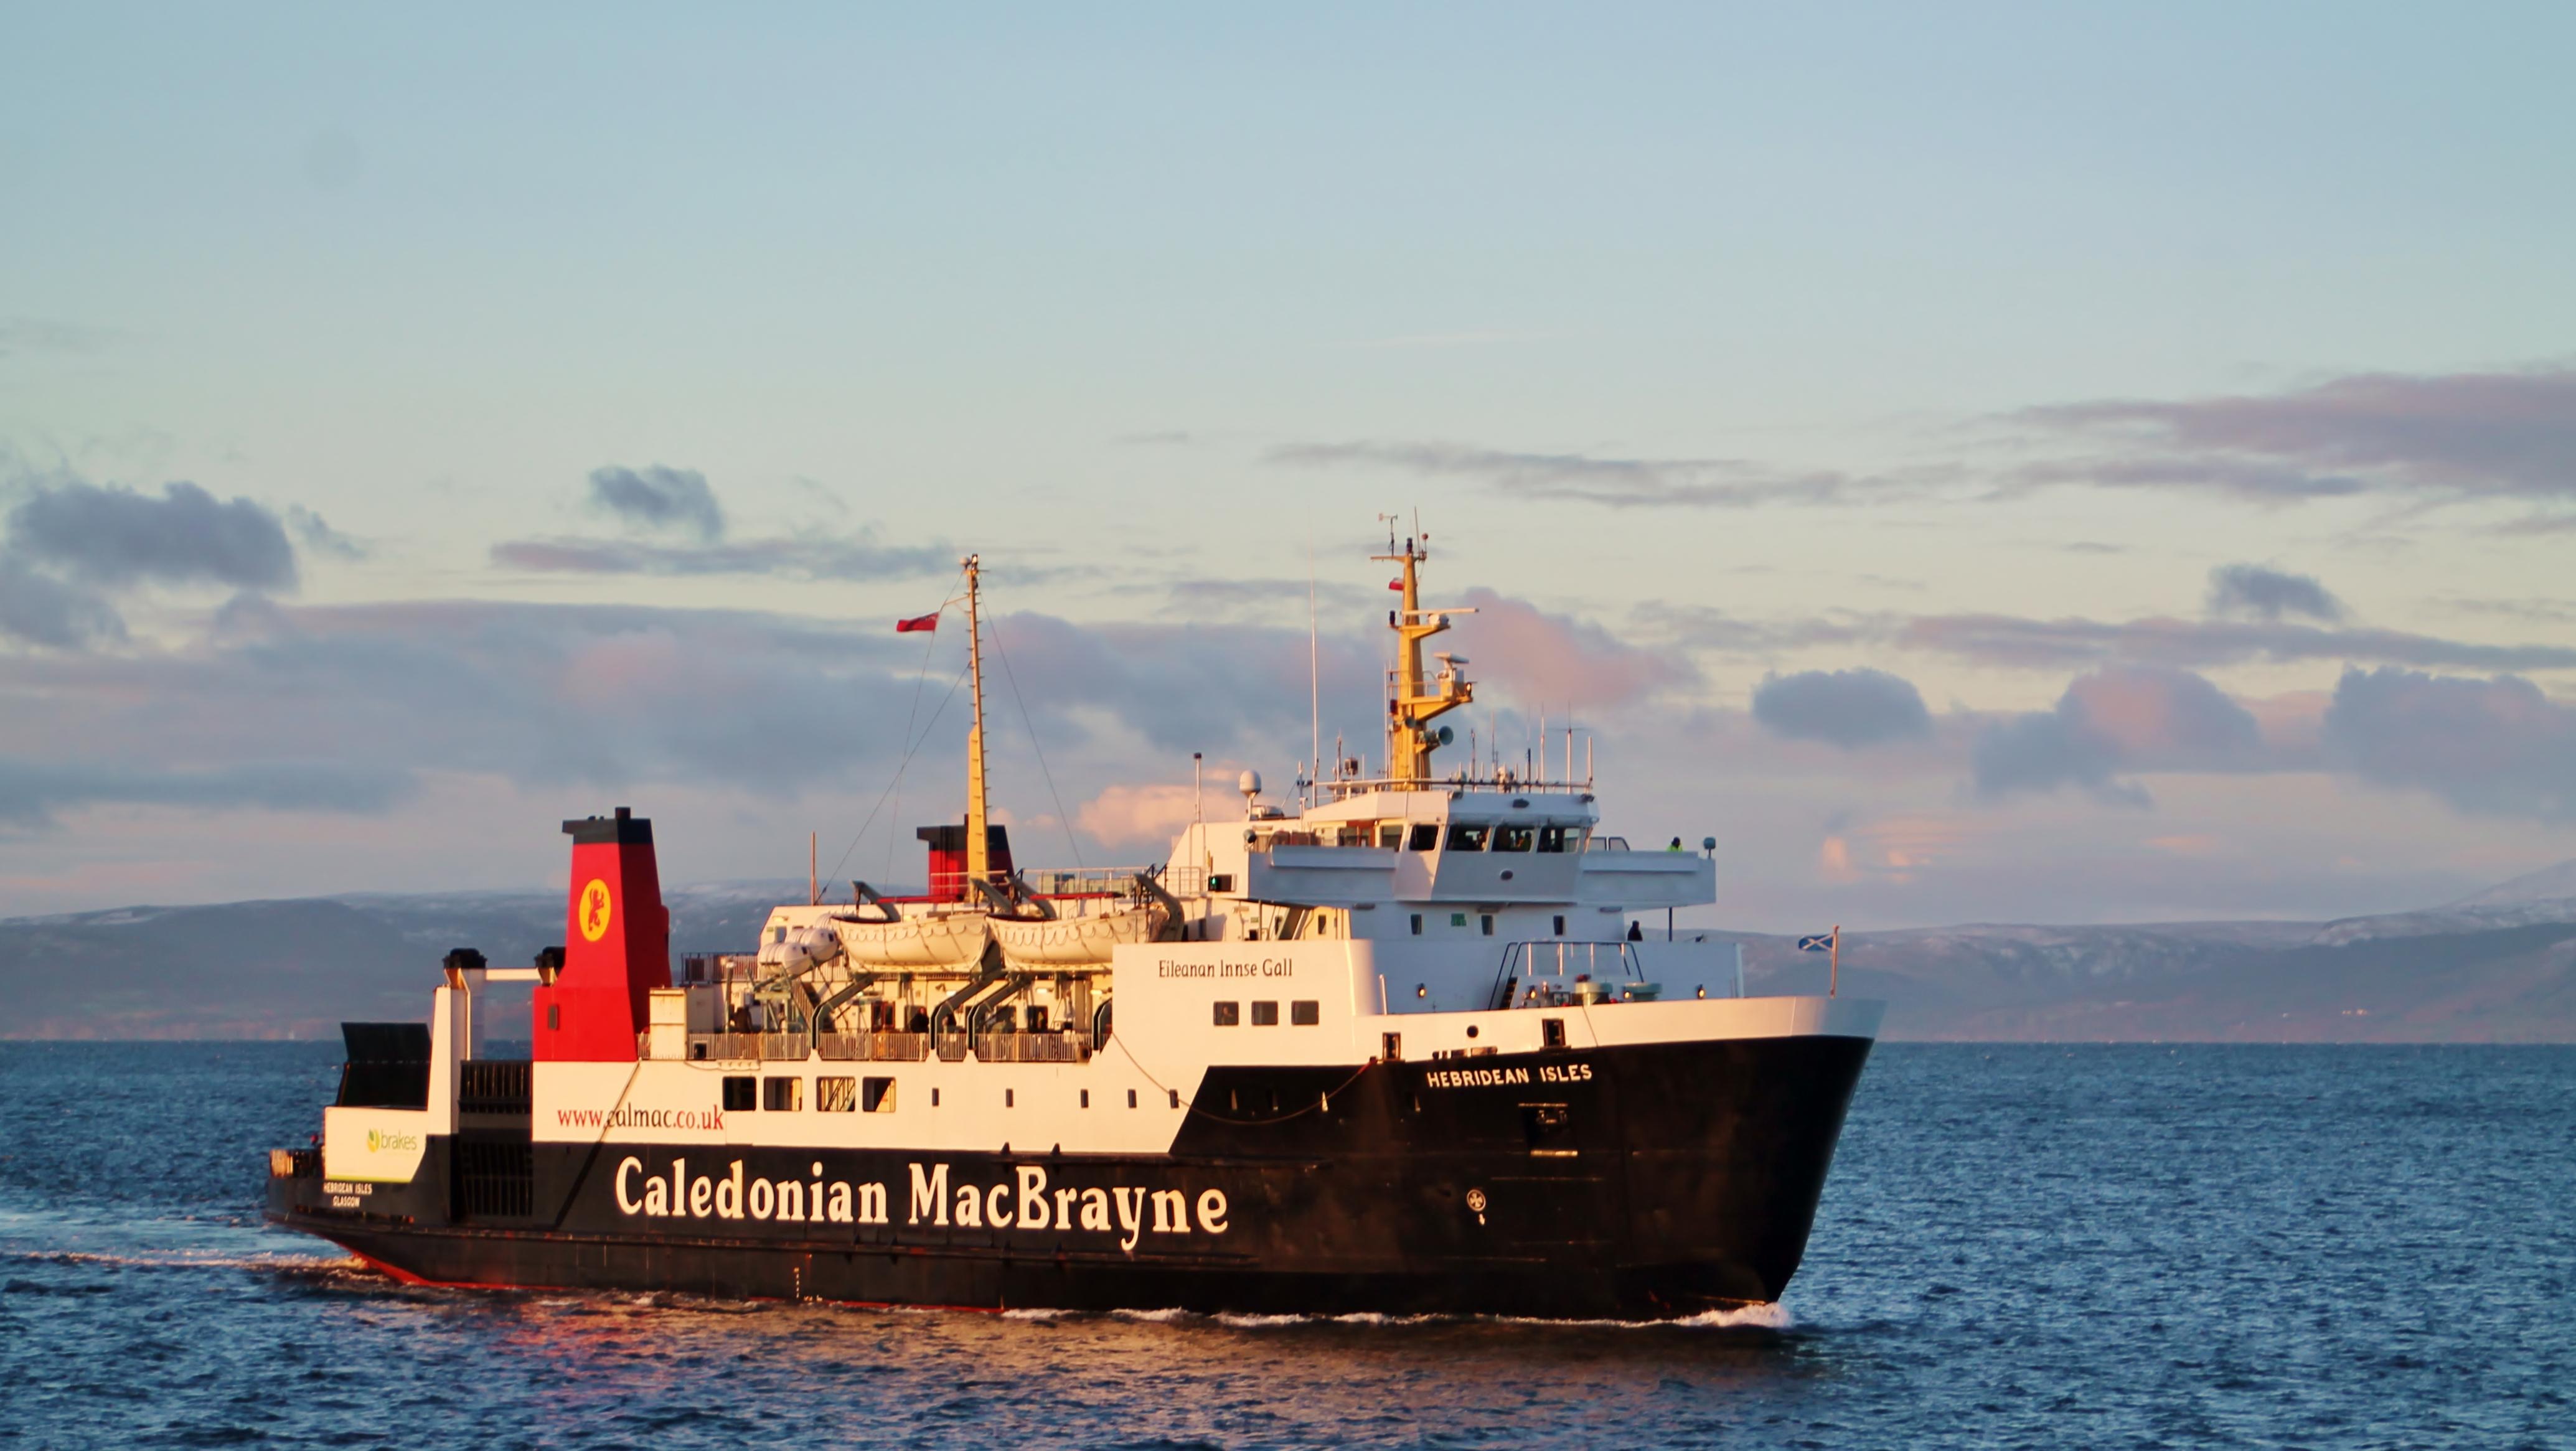 Hebridean Isles arriving at Ardrossan (Ships of CalMac)